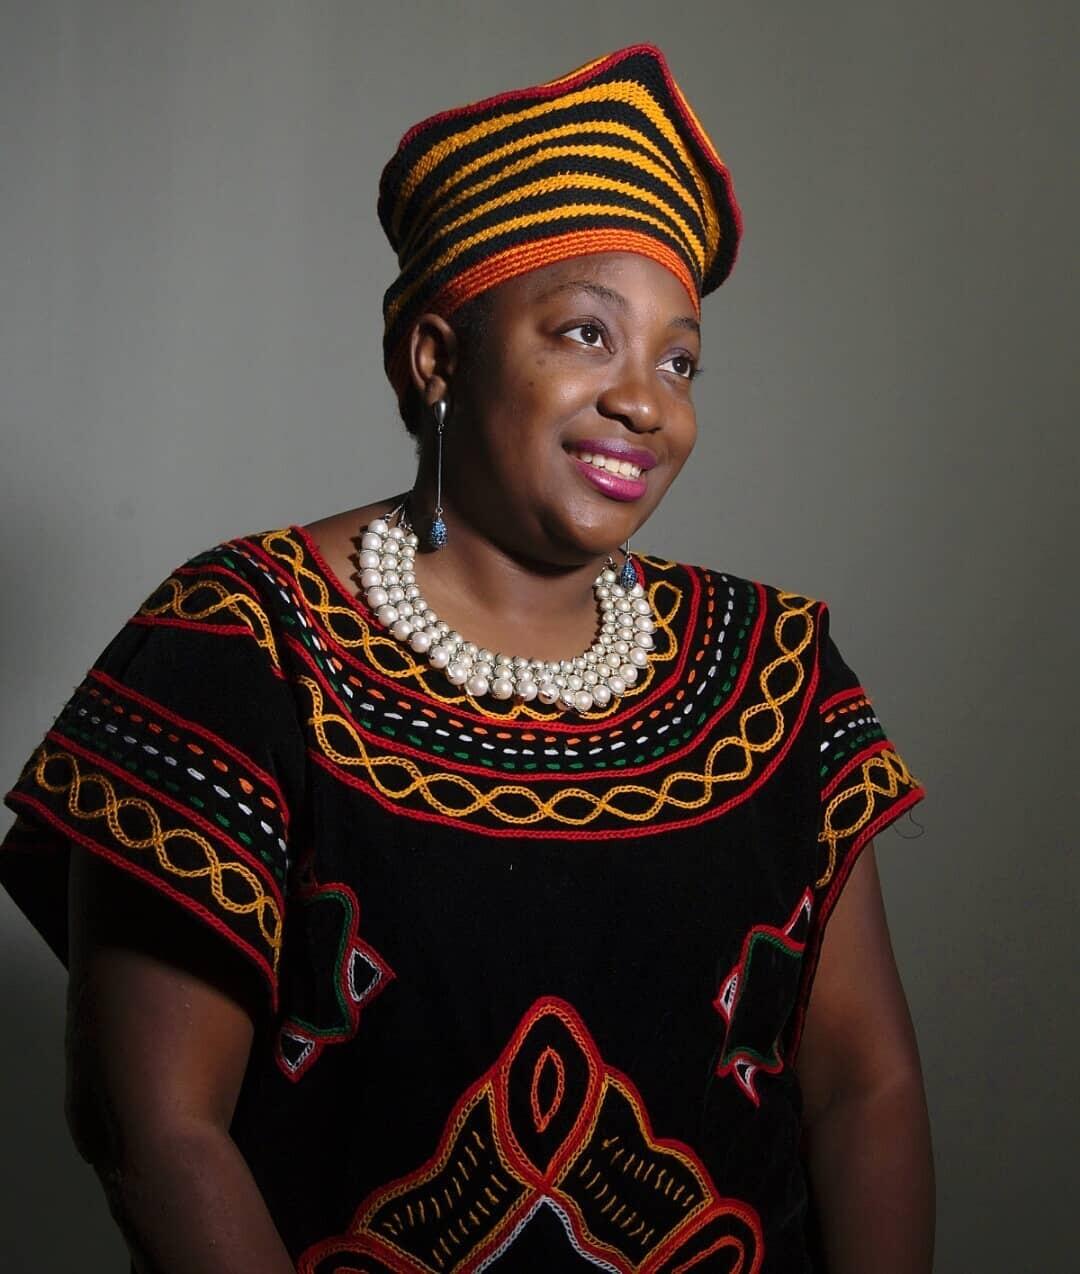 Colourful Cameroon Fashion Yefon Mainsah